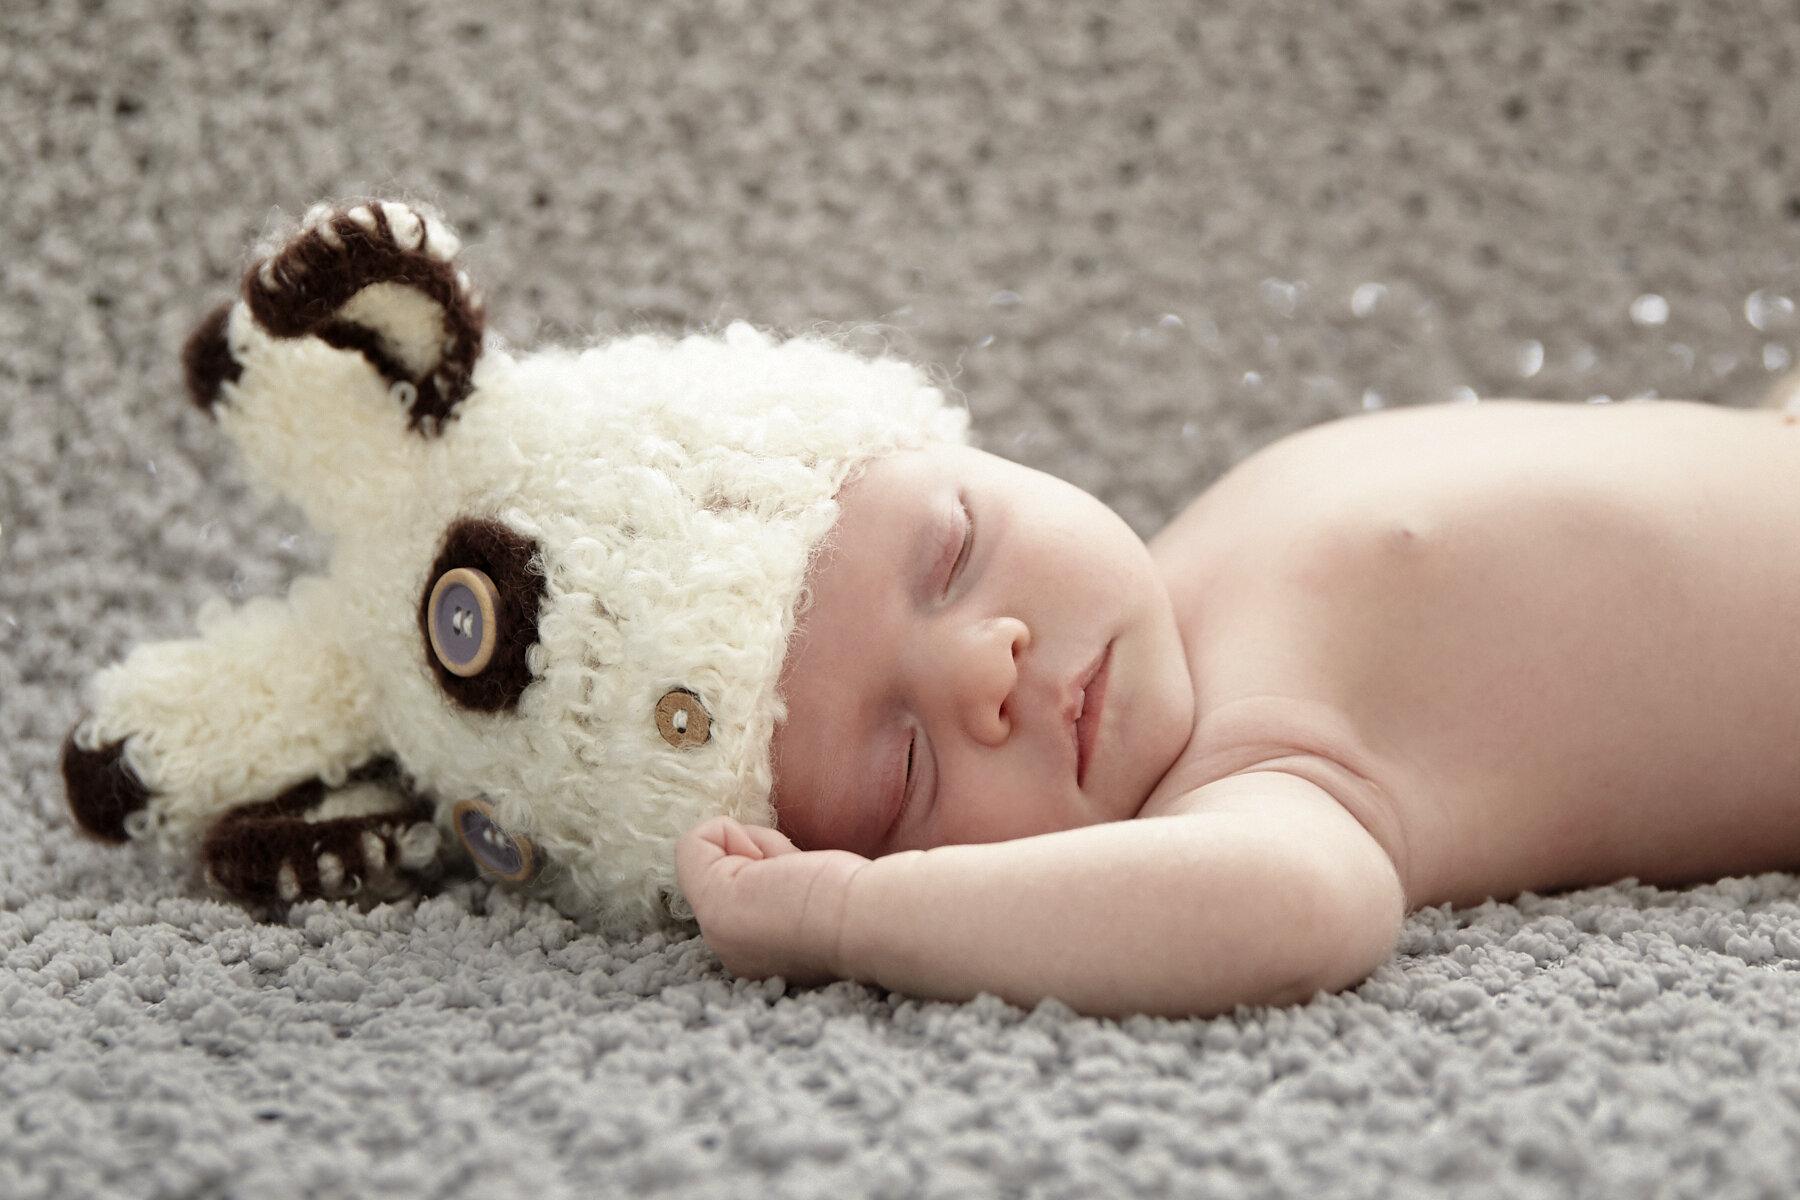 cindy-moleski-professional-portrait-baby-newborn-sweetness-photographer-saskatoon-saskatchewan-29592-0133e.jpg